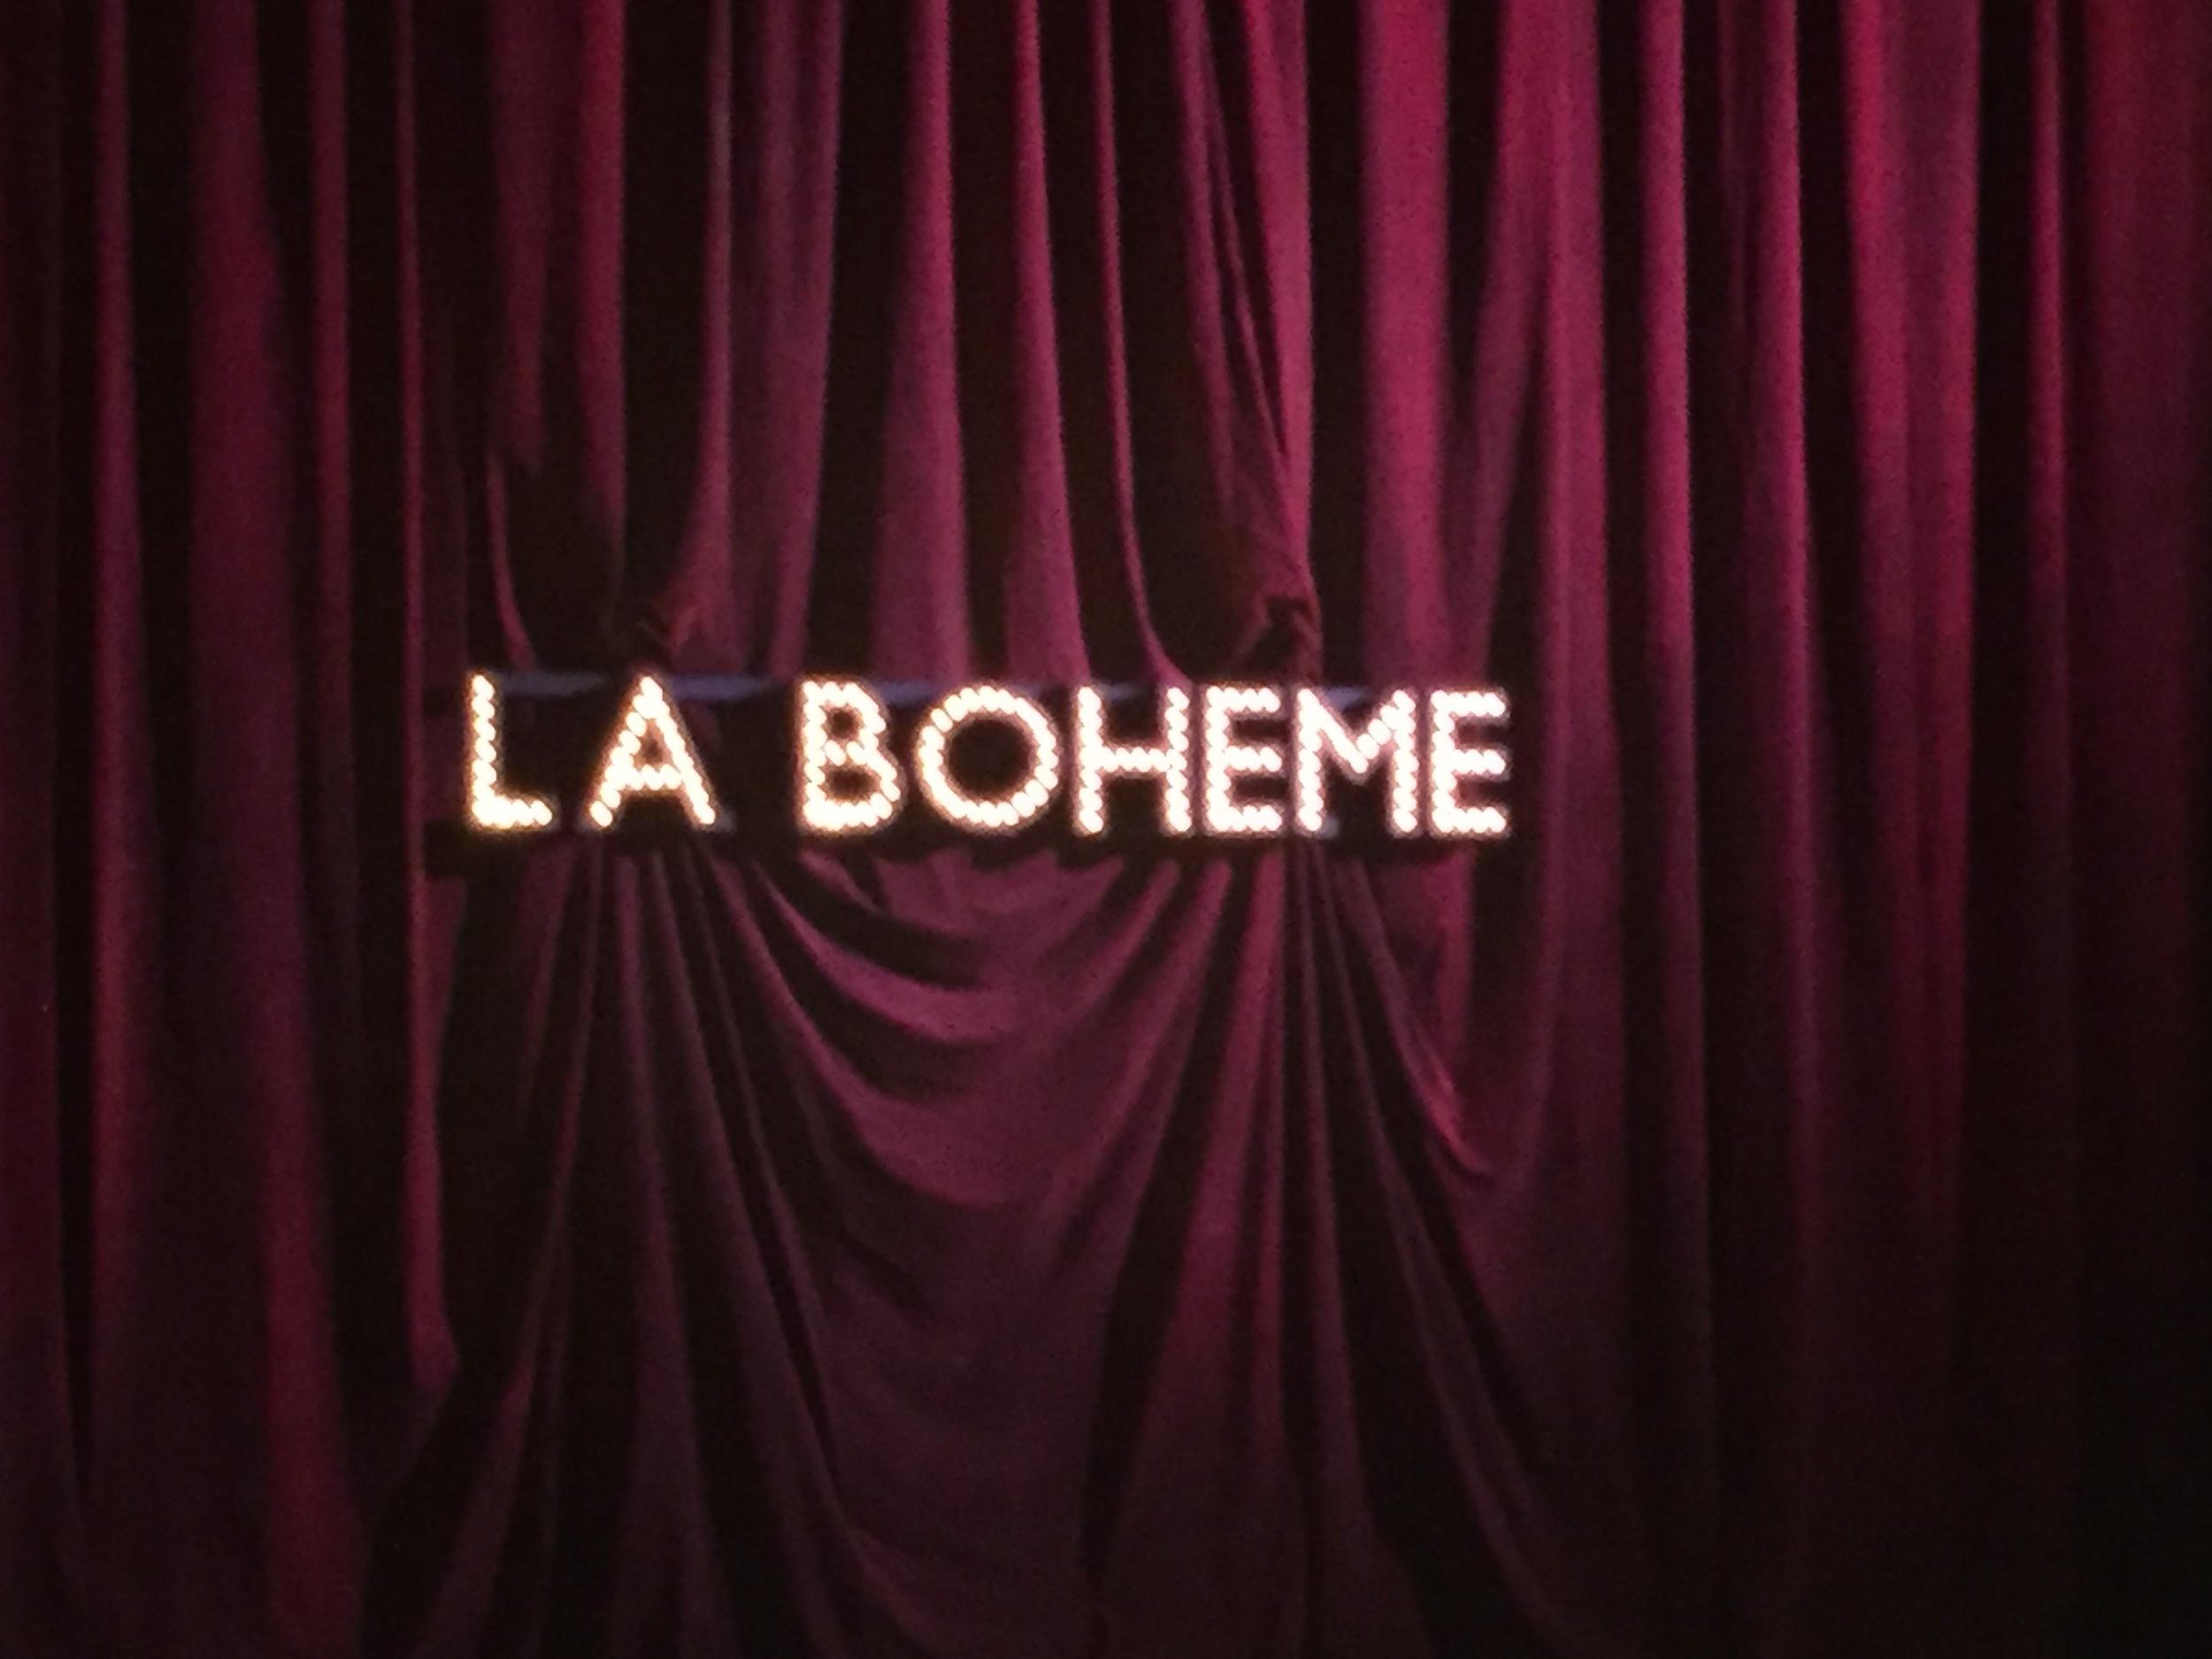 La Boheme at Sydney Opera House